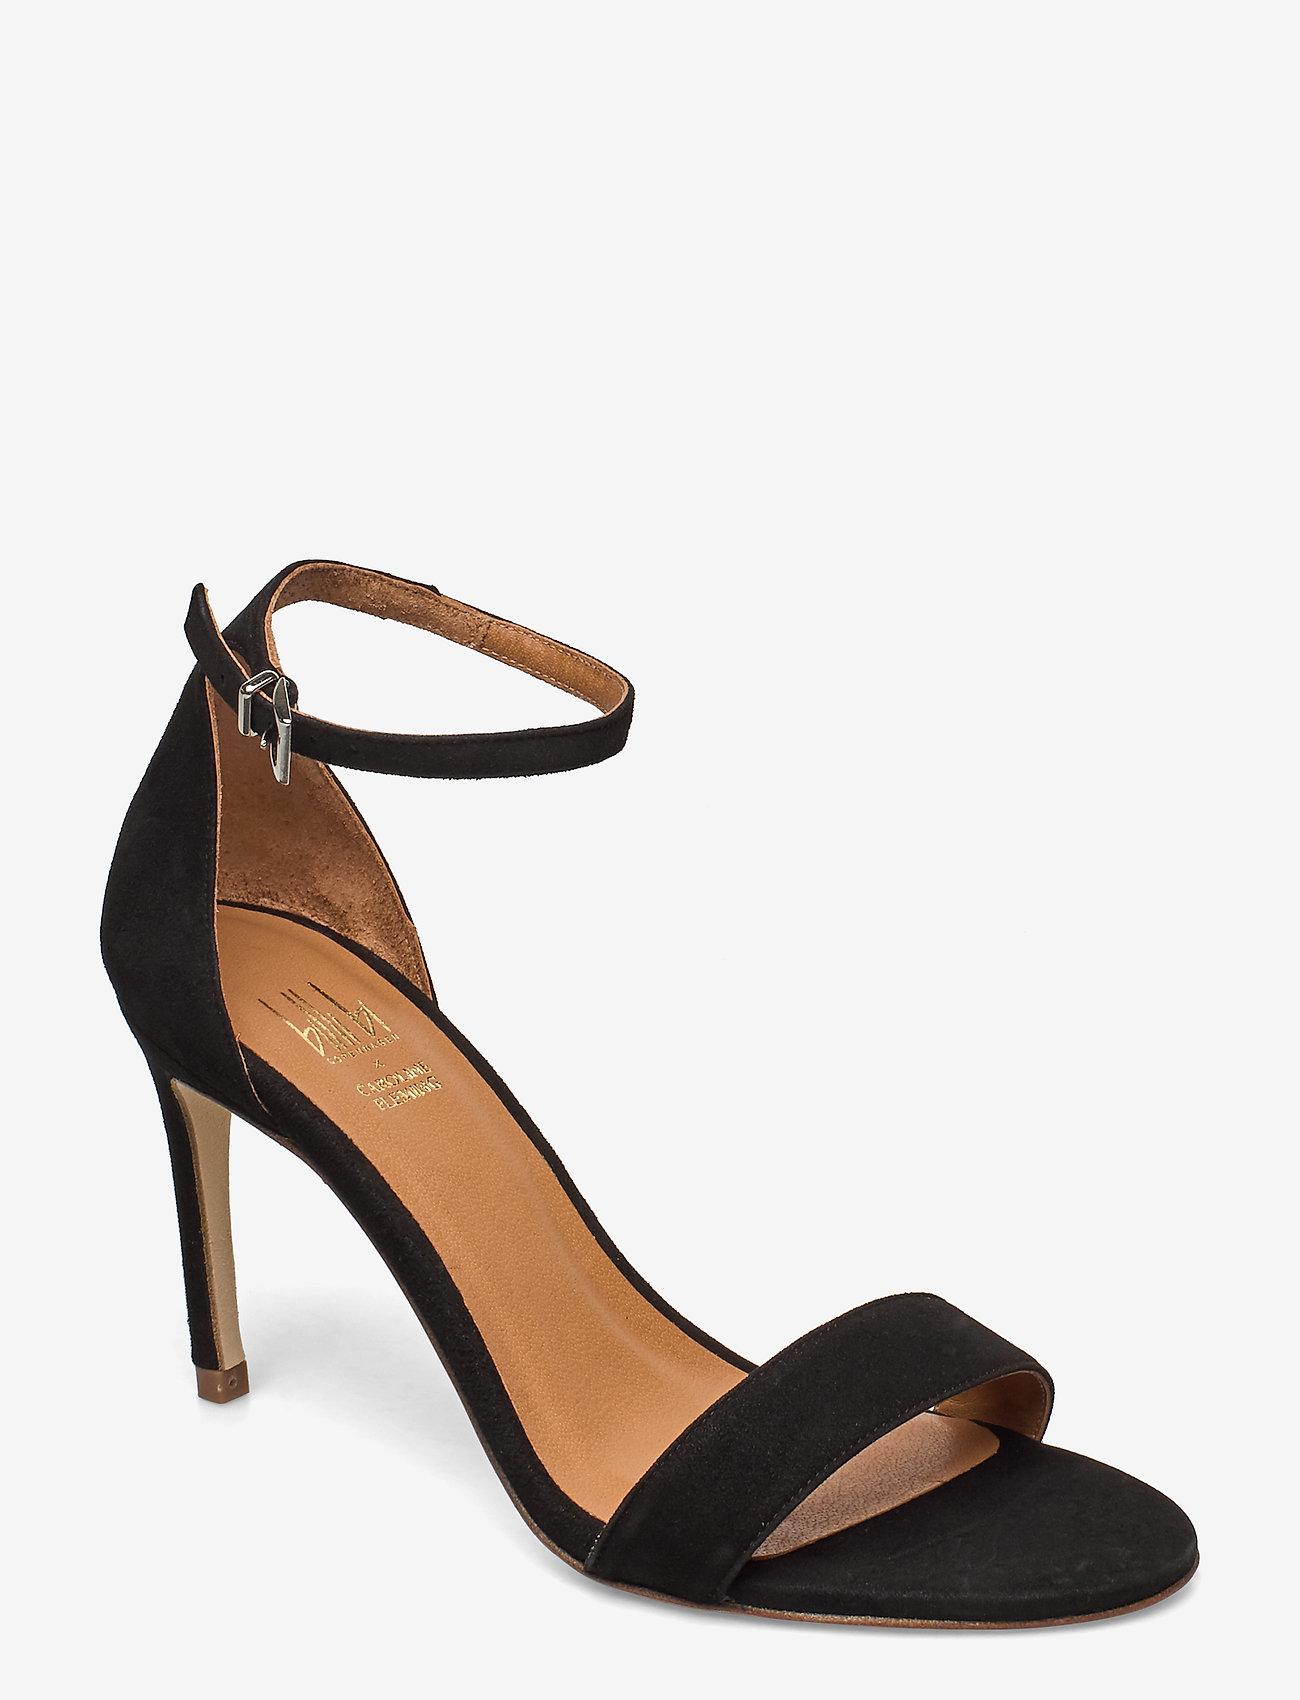 14451 Sandals (Black Suede 50) (146.30